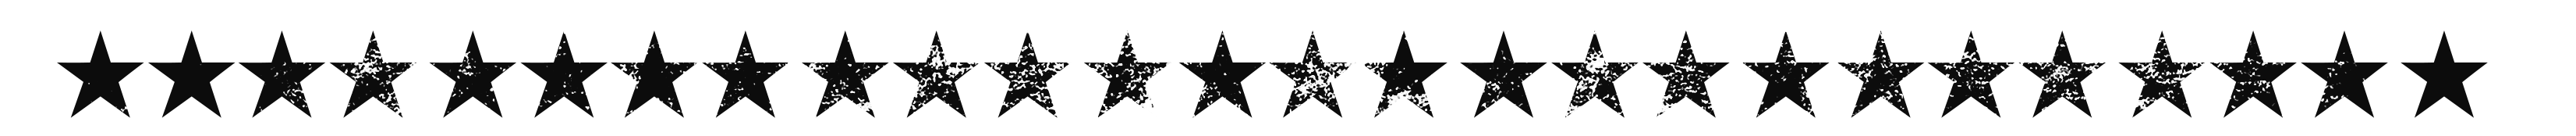 stars-row